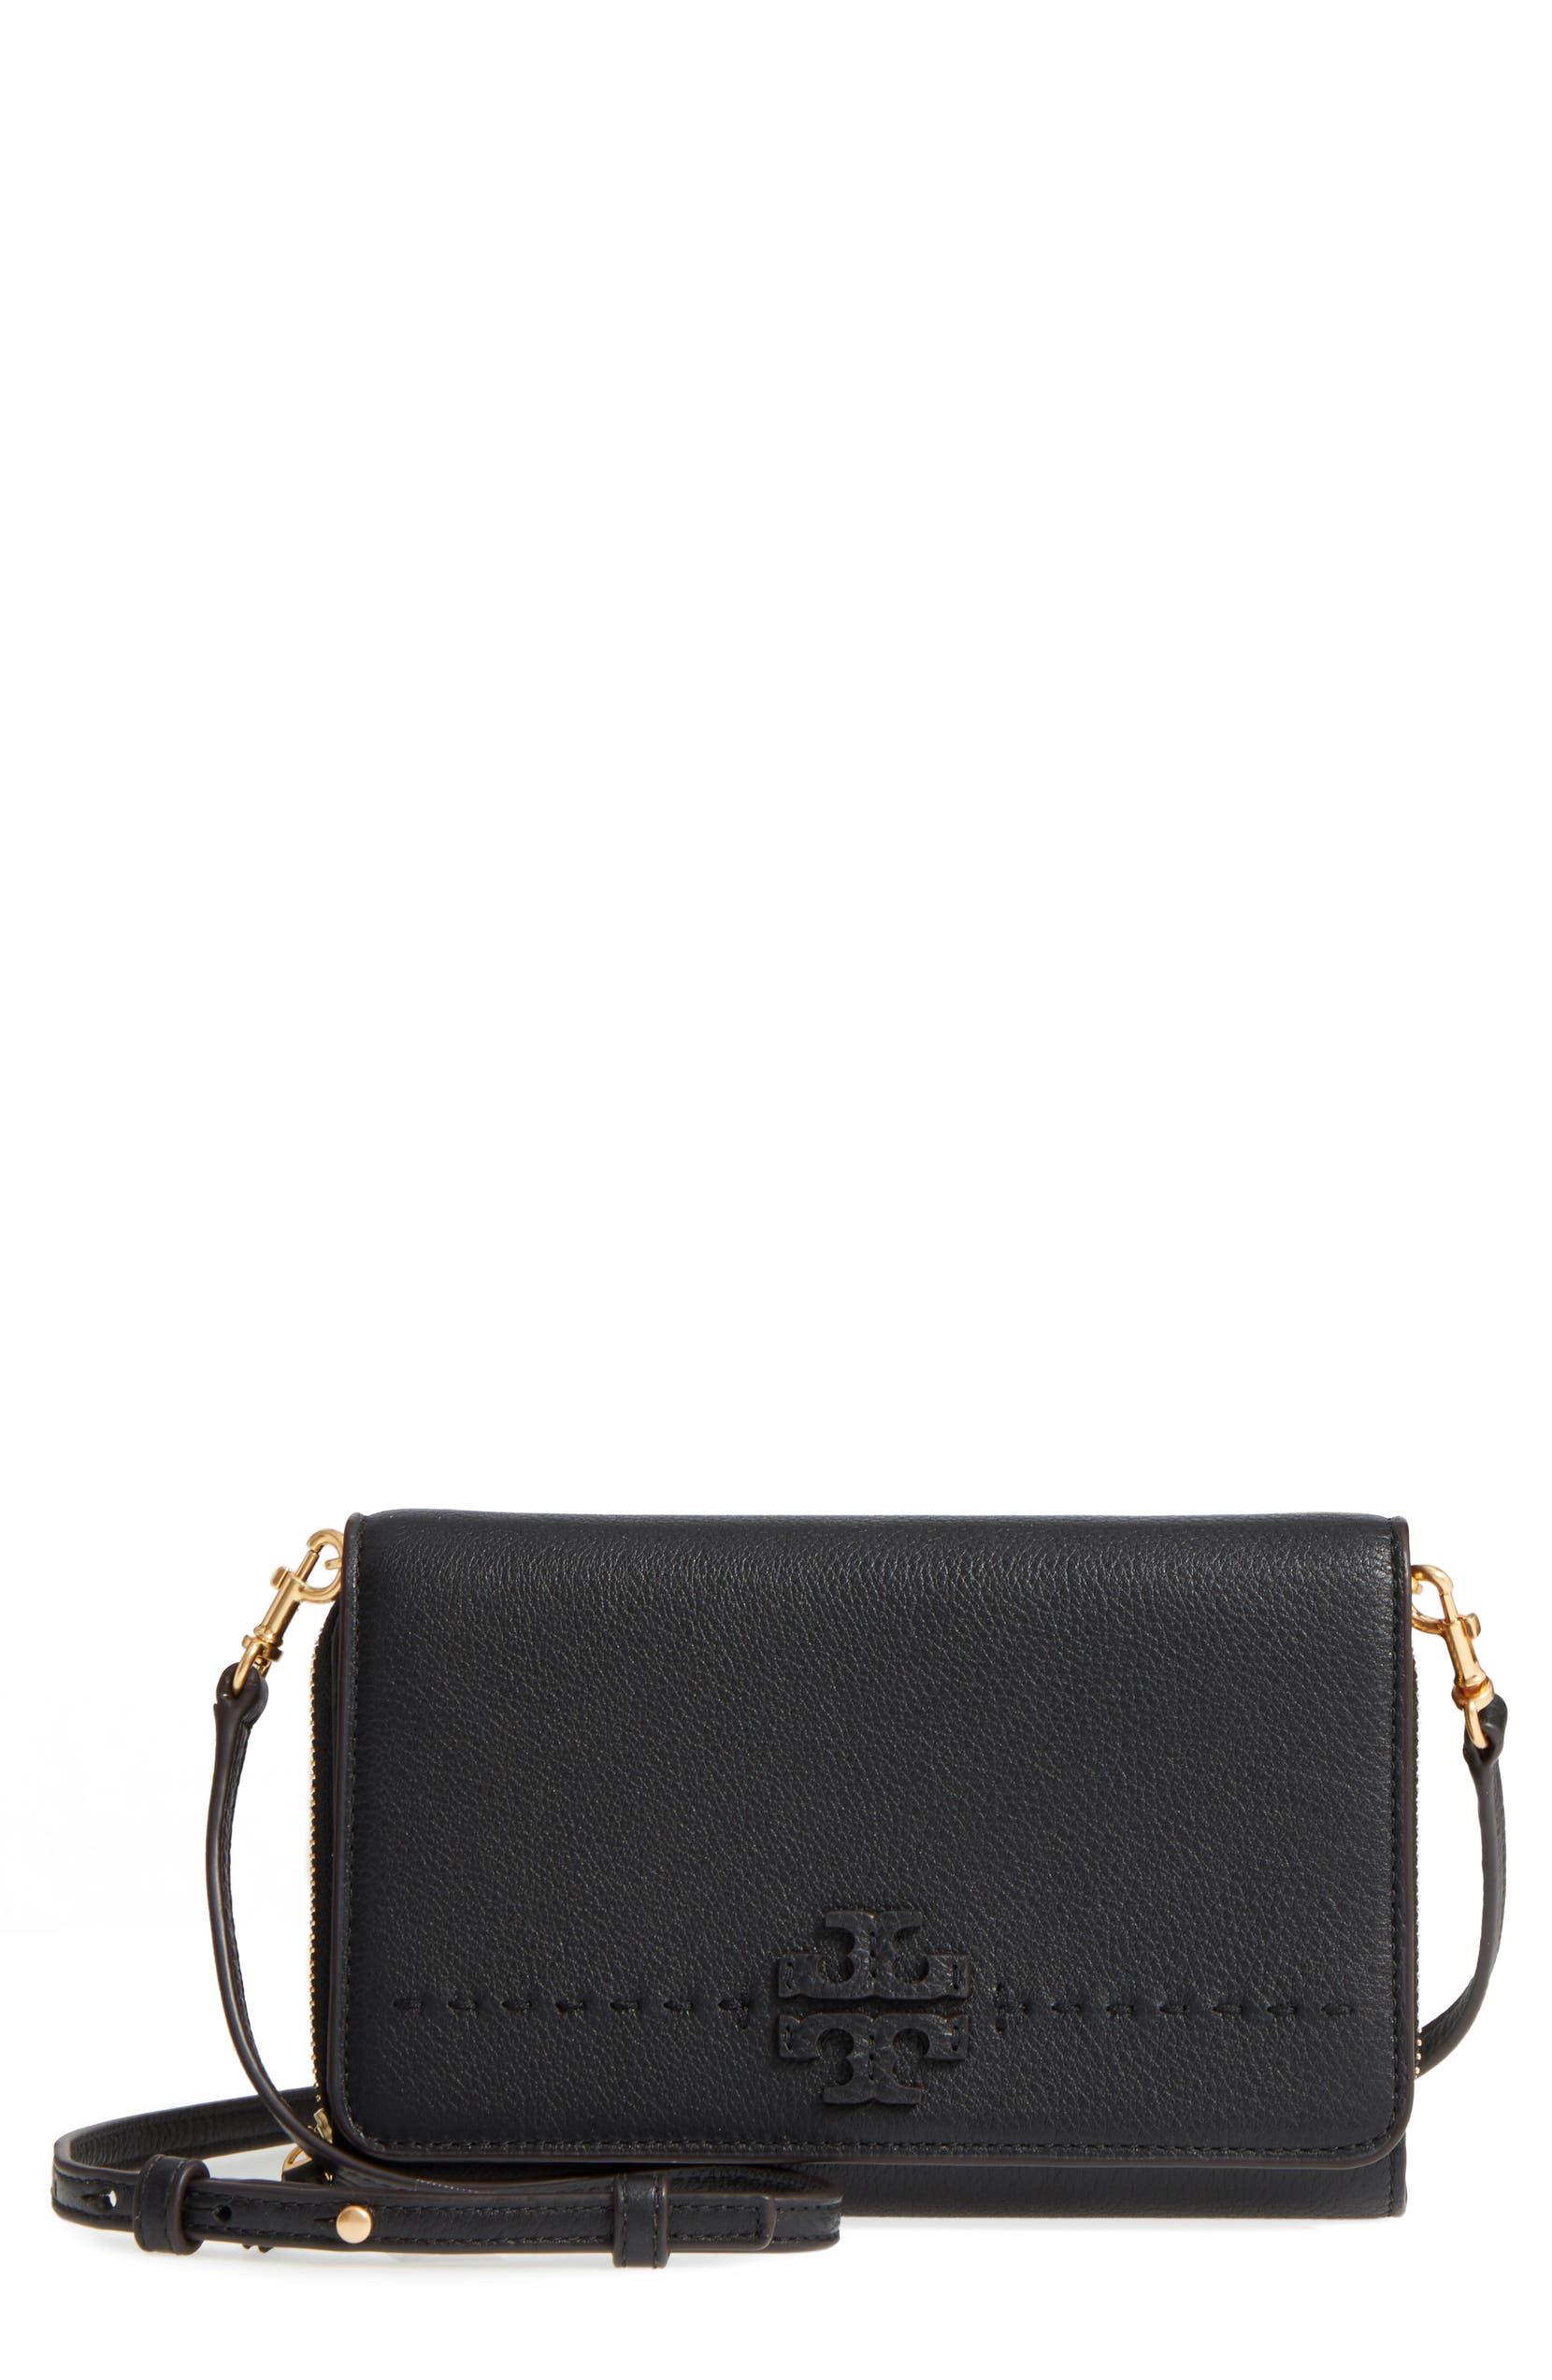 Tory Burch McGraw Leather Crossbody Wallet  c12d0fe3ac143